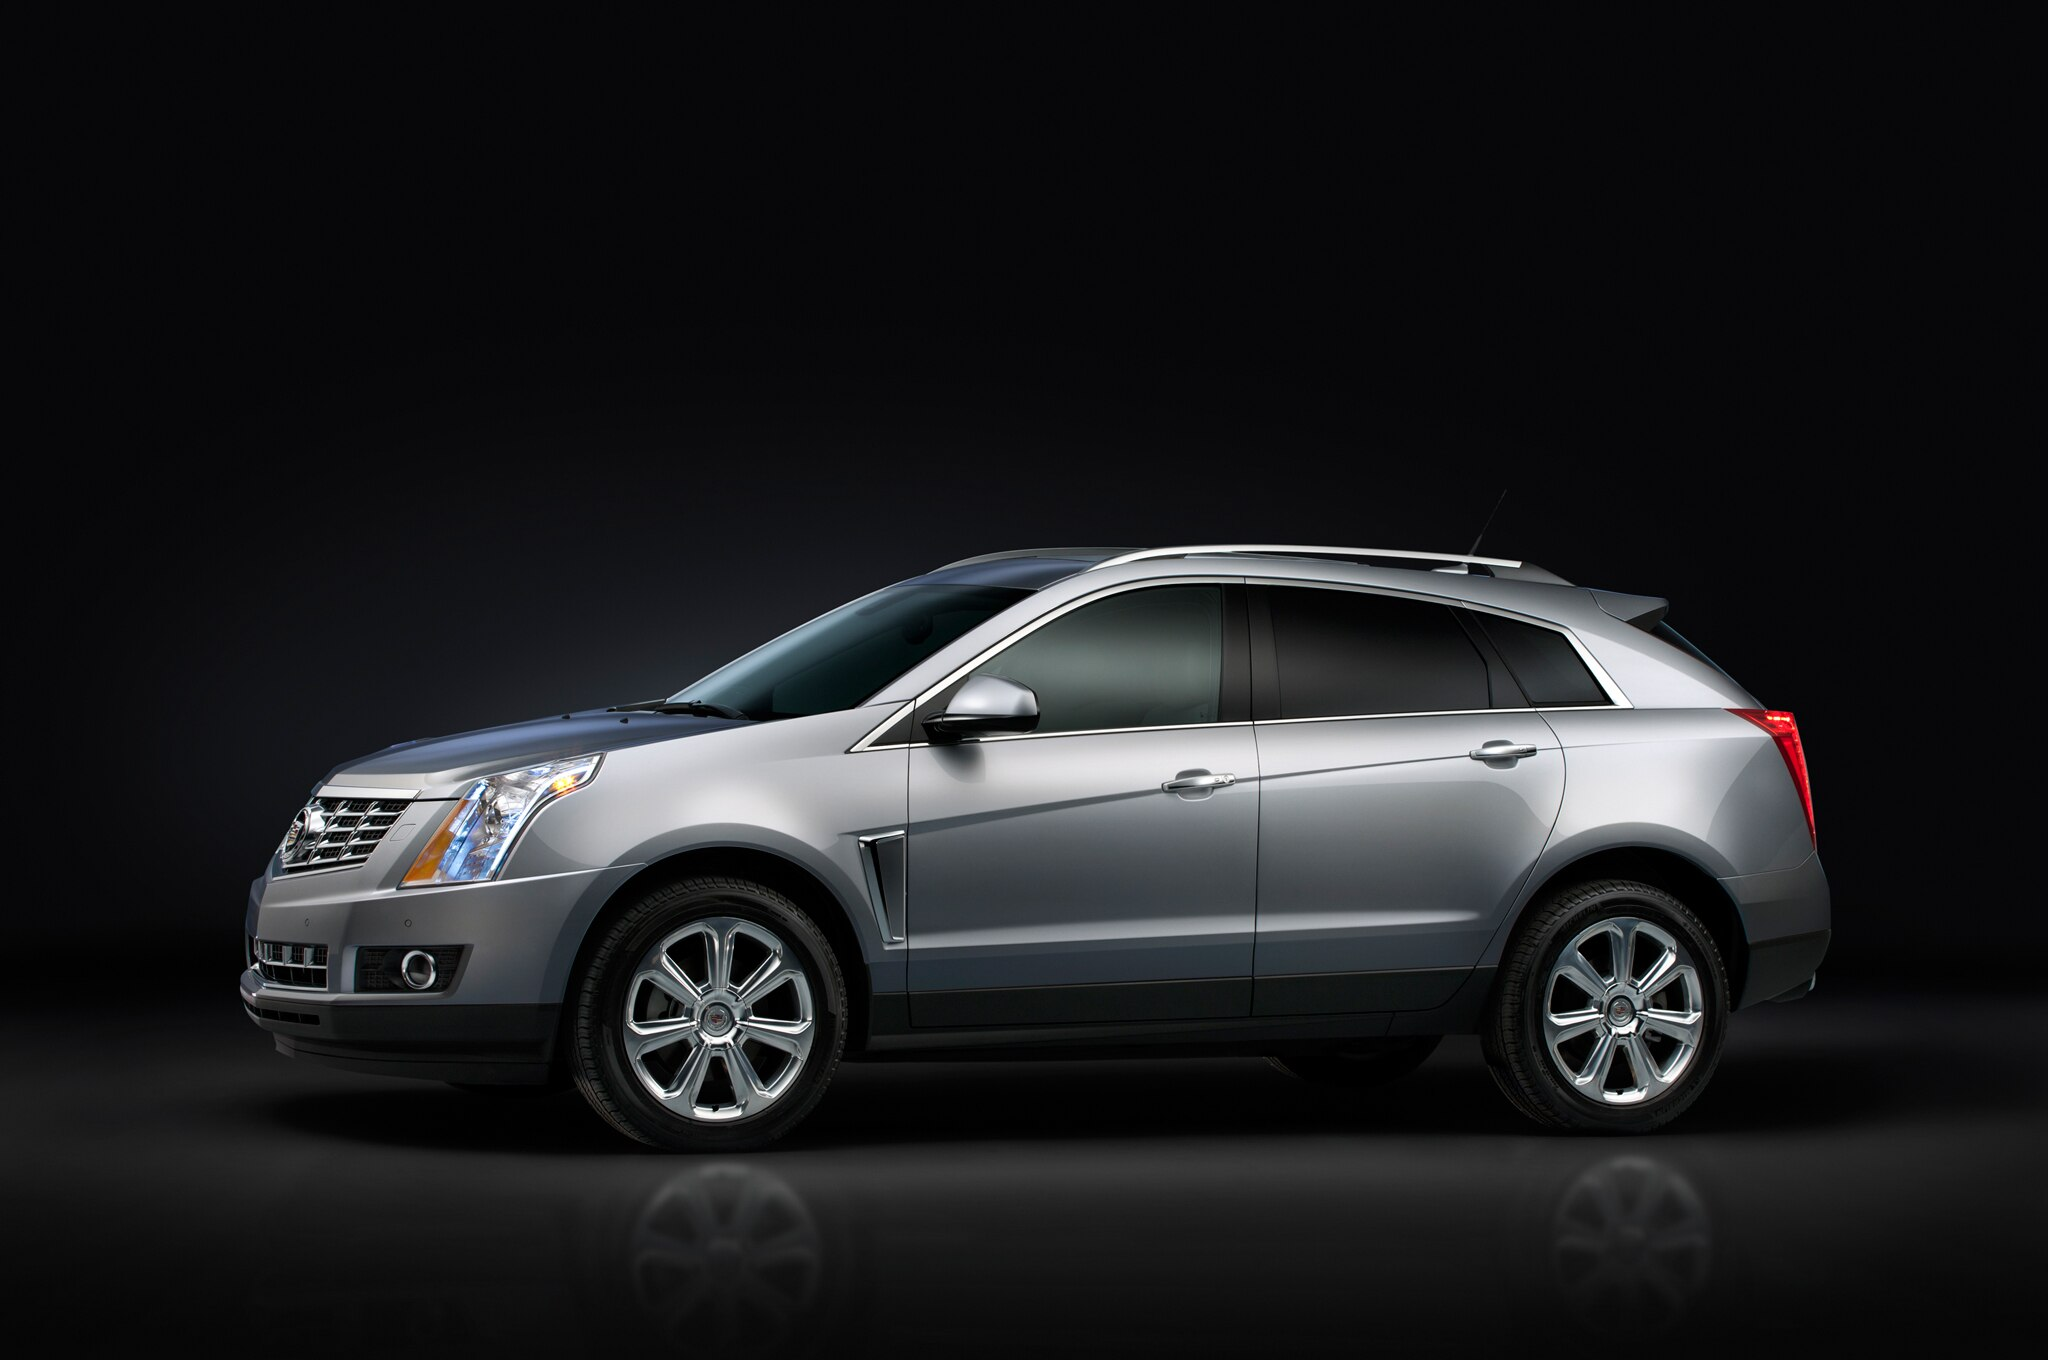 2013 Cadillac SRX Profile1